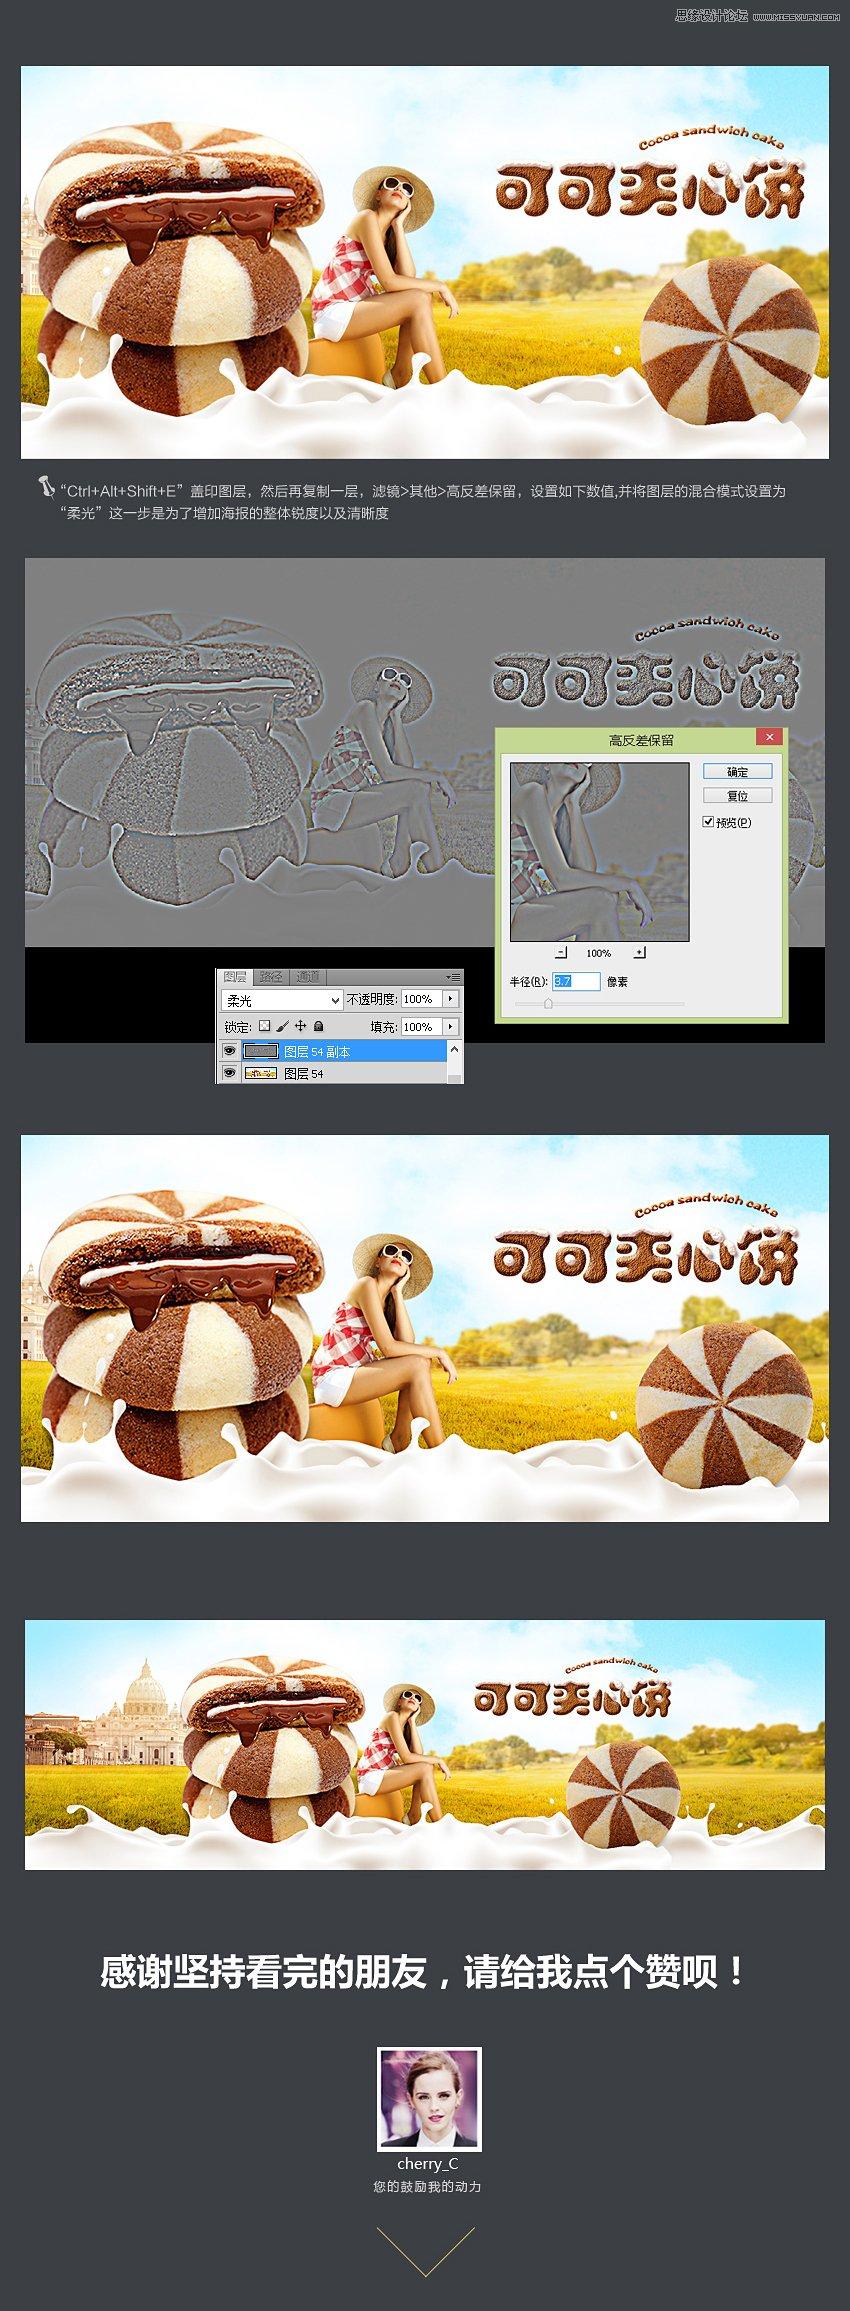 Photoshop设计夹心饼干电商促销海报设计教程